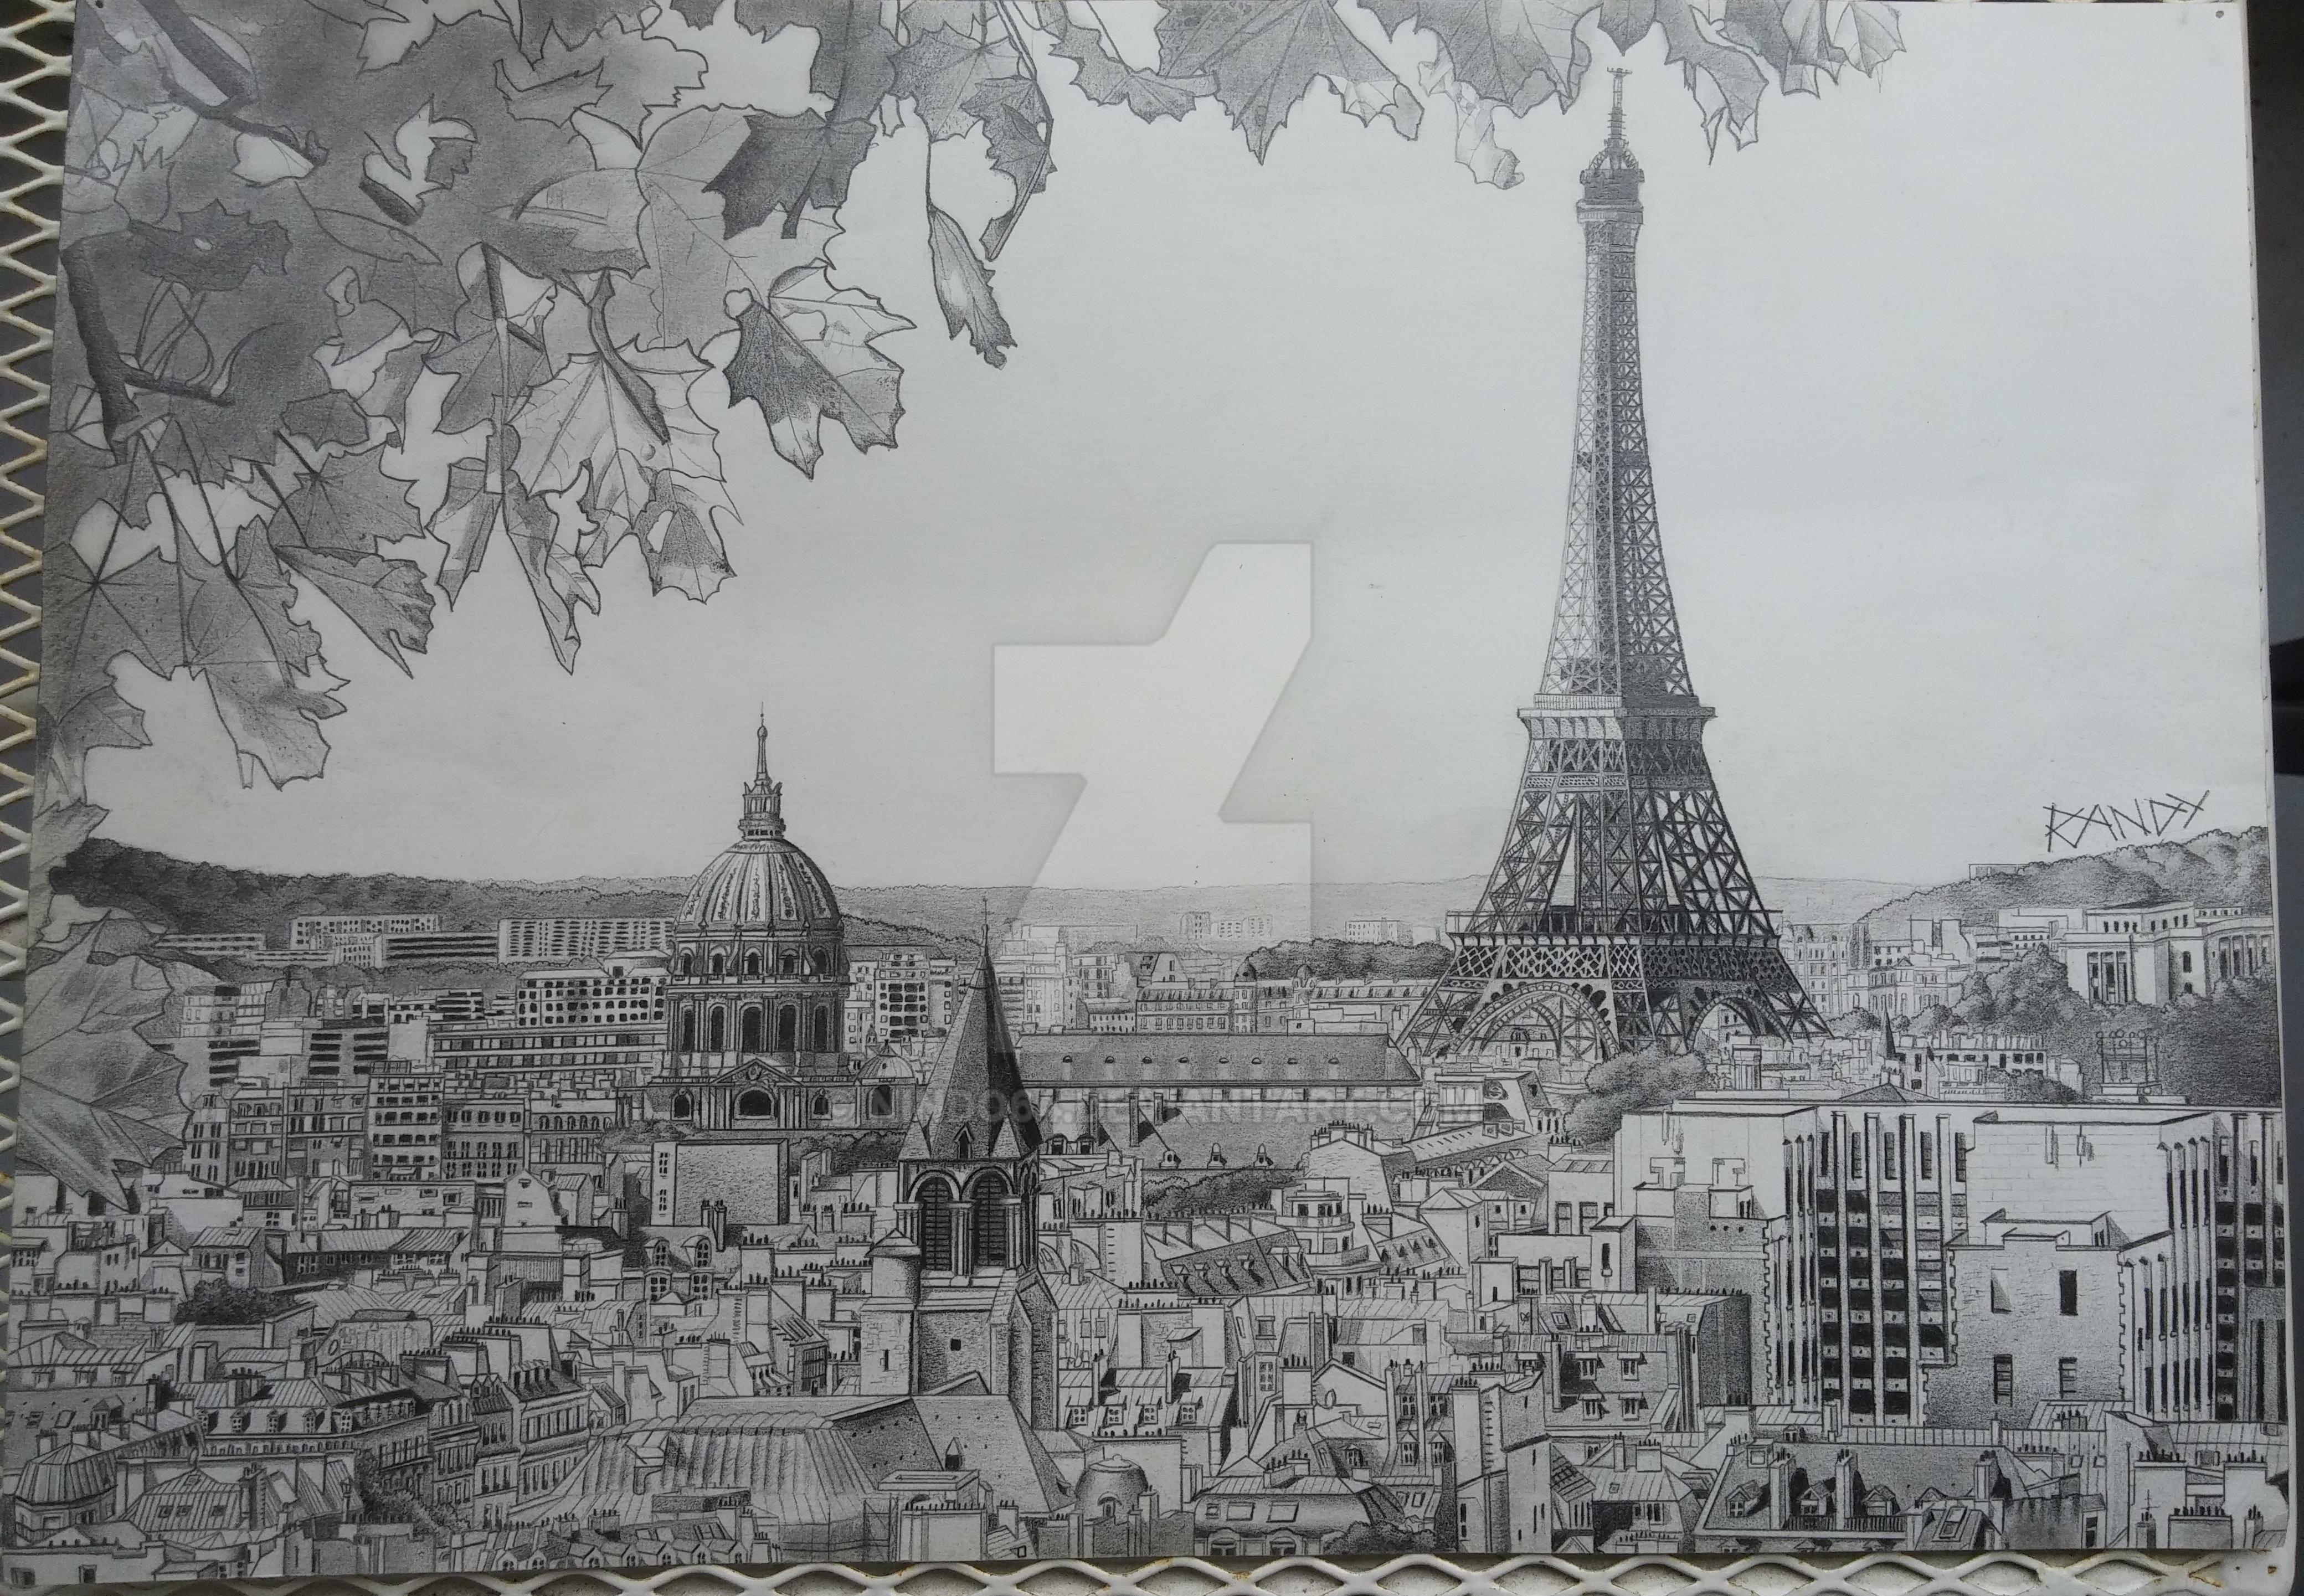 paris____by_nindo64-d88rj71.jpg